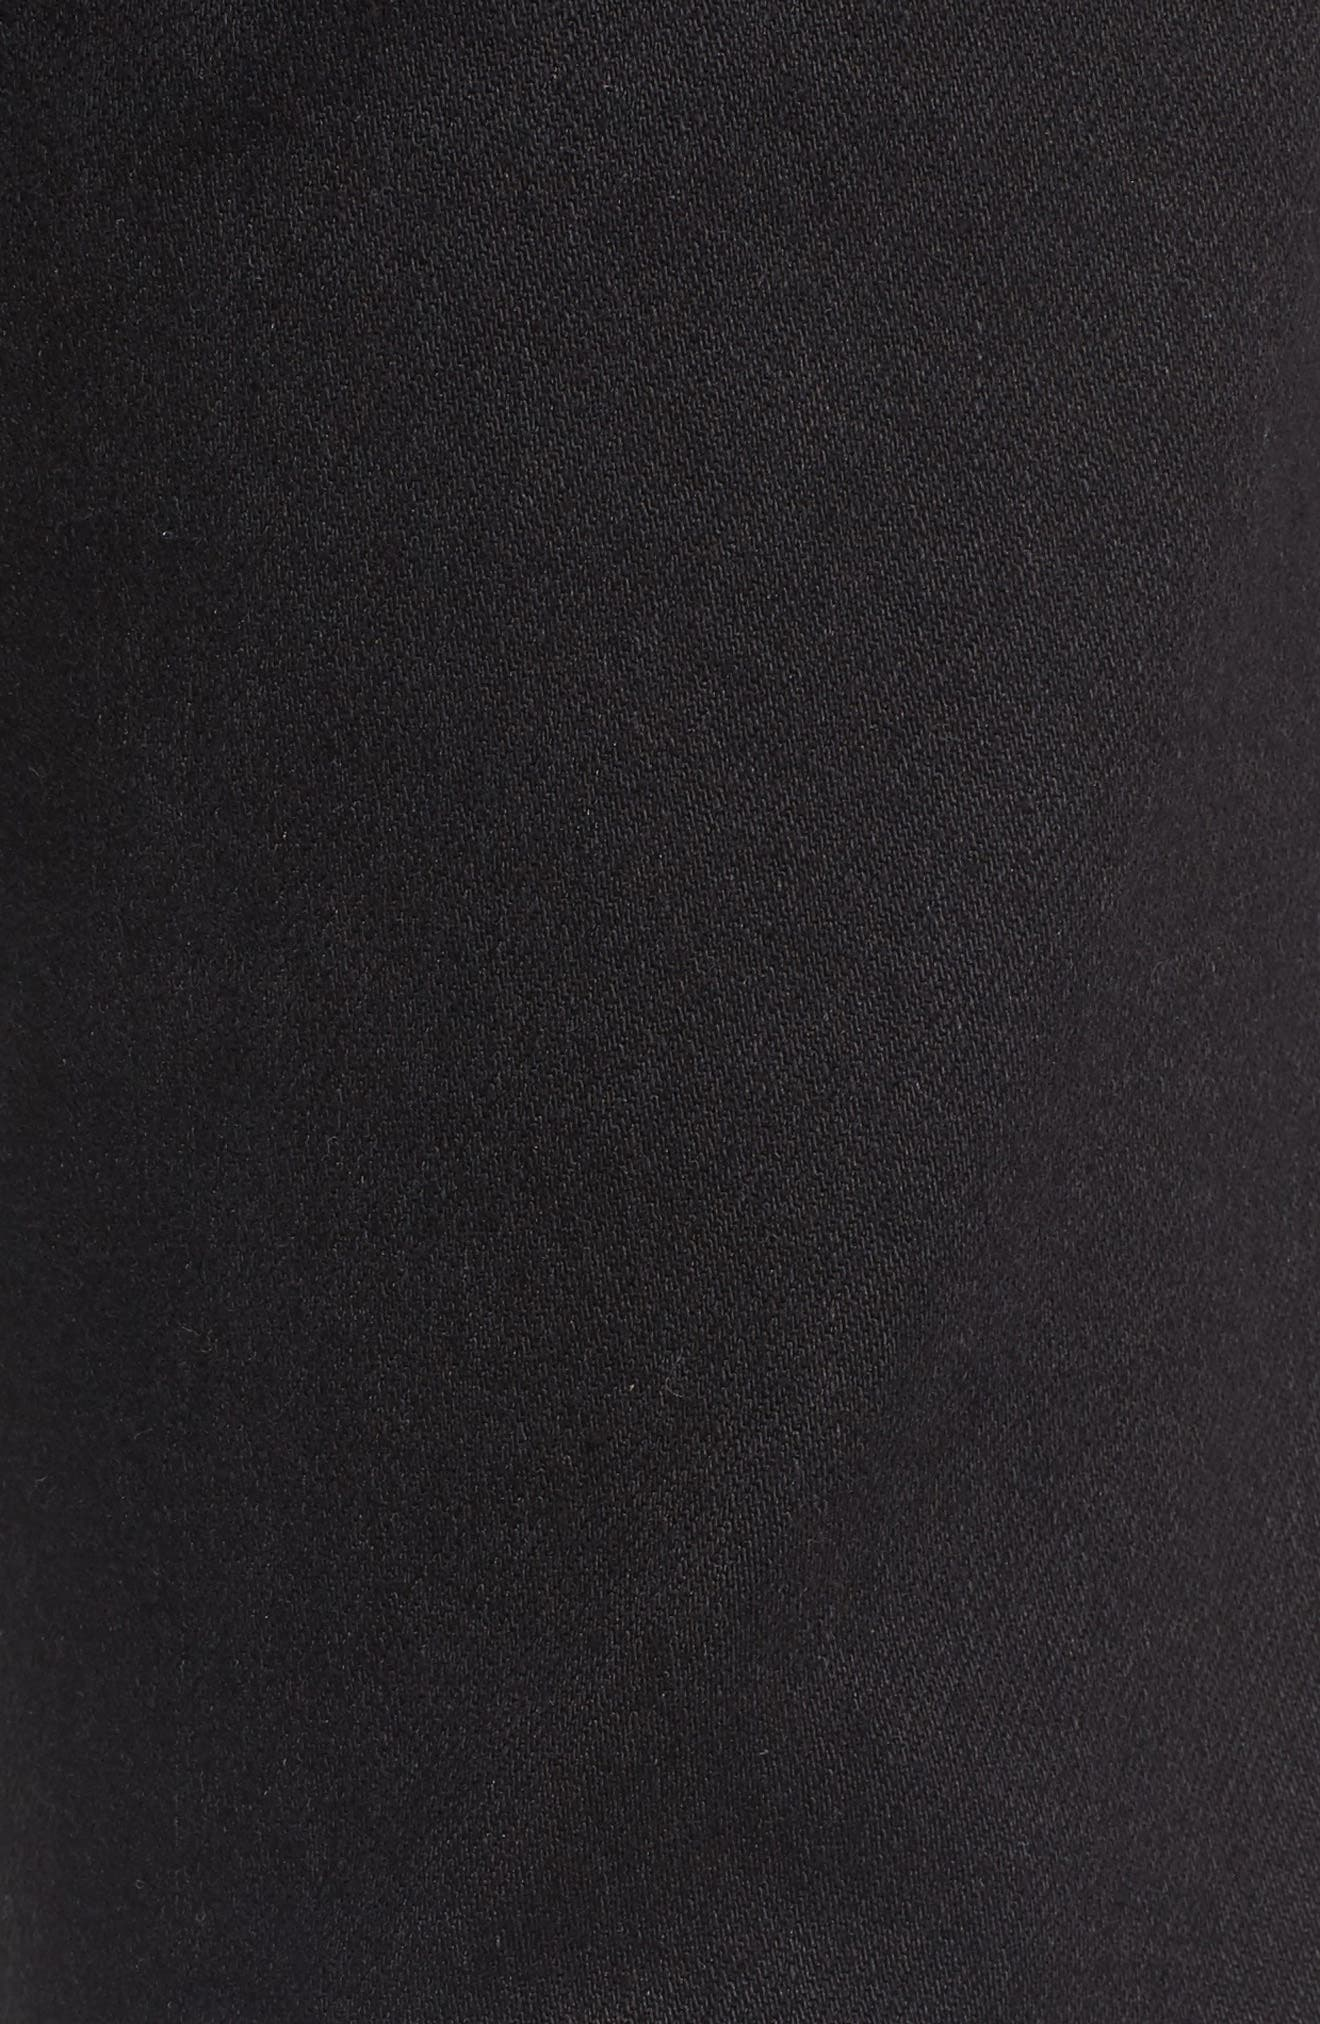 Juvee II Flooded Skinny Fit Jeans,                             Alternate thumbnail 5, color,                             001